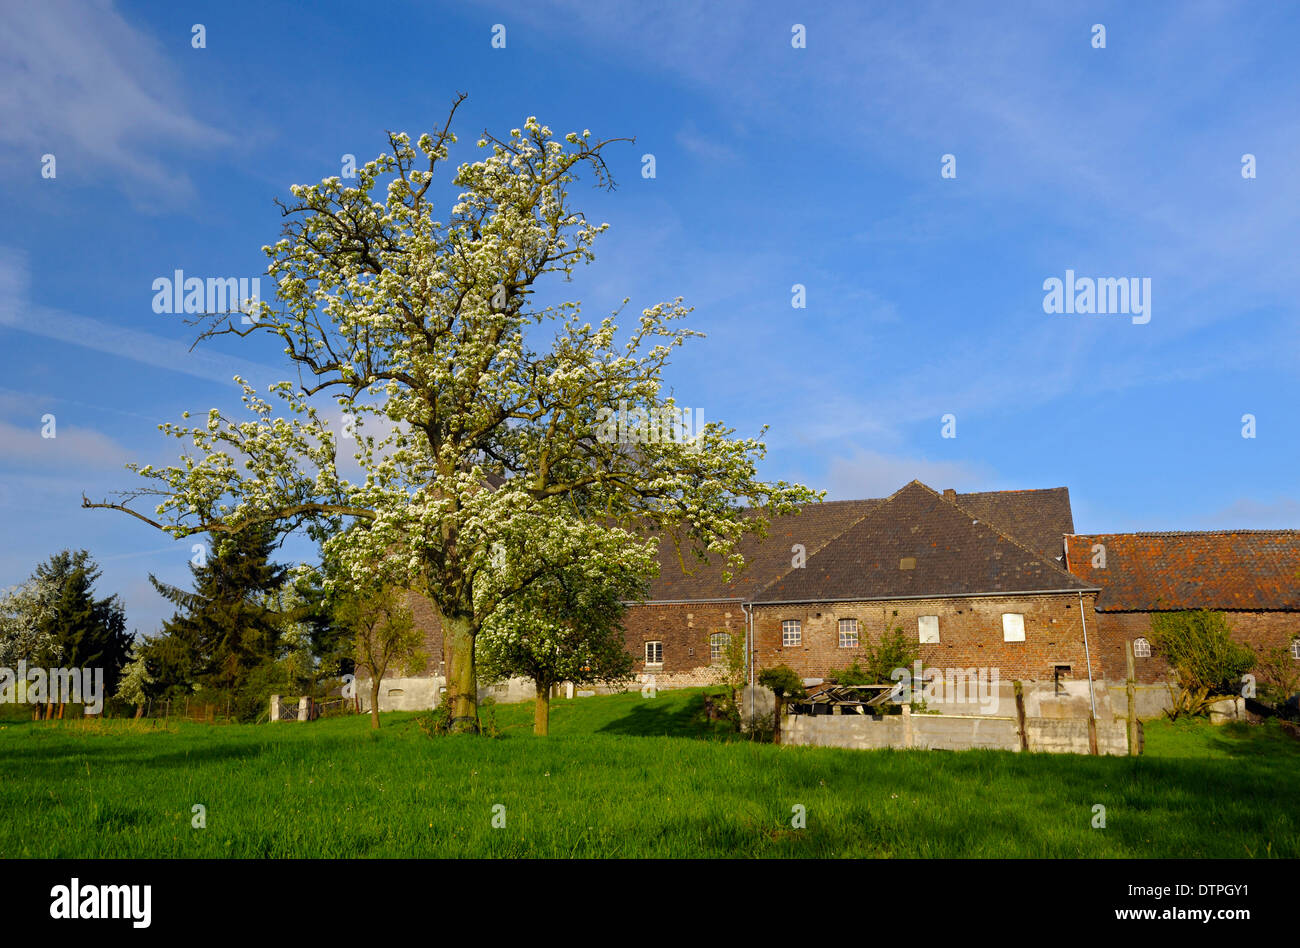 Fruit tree, Voerde-Lohnen, North Rhine-Westphalia, Germany / Voerde-Löhnen - Stock Image